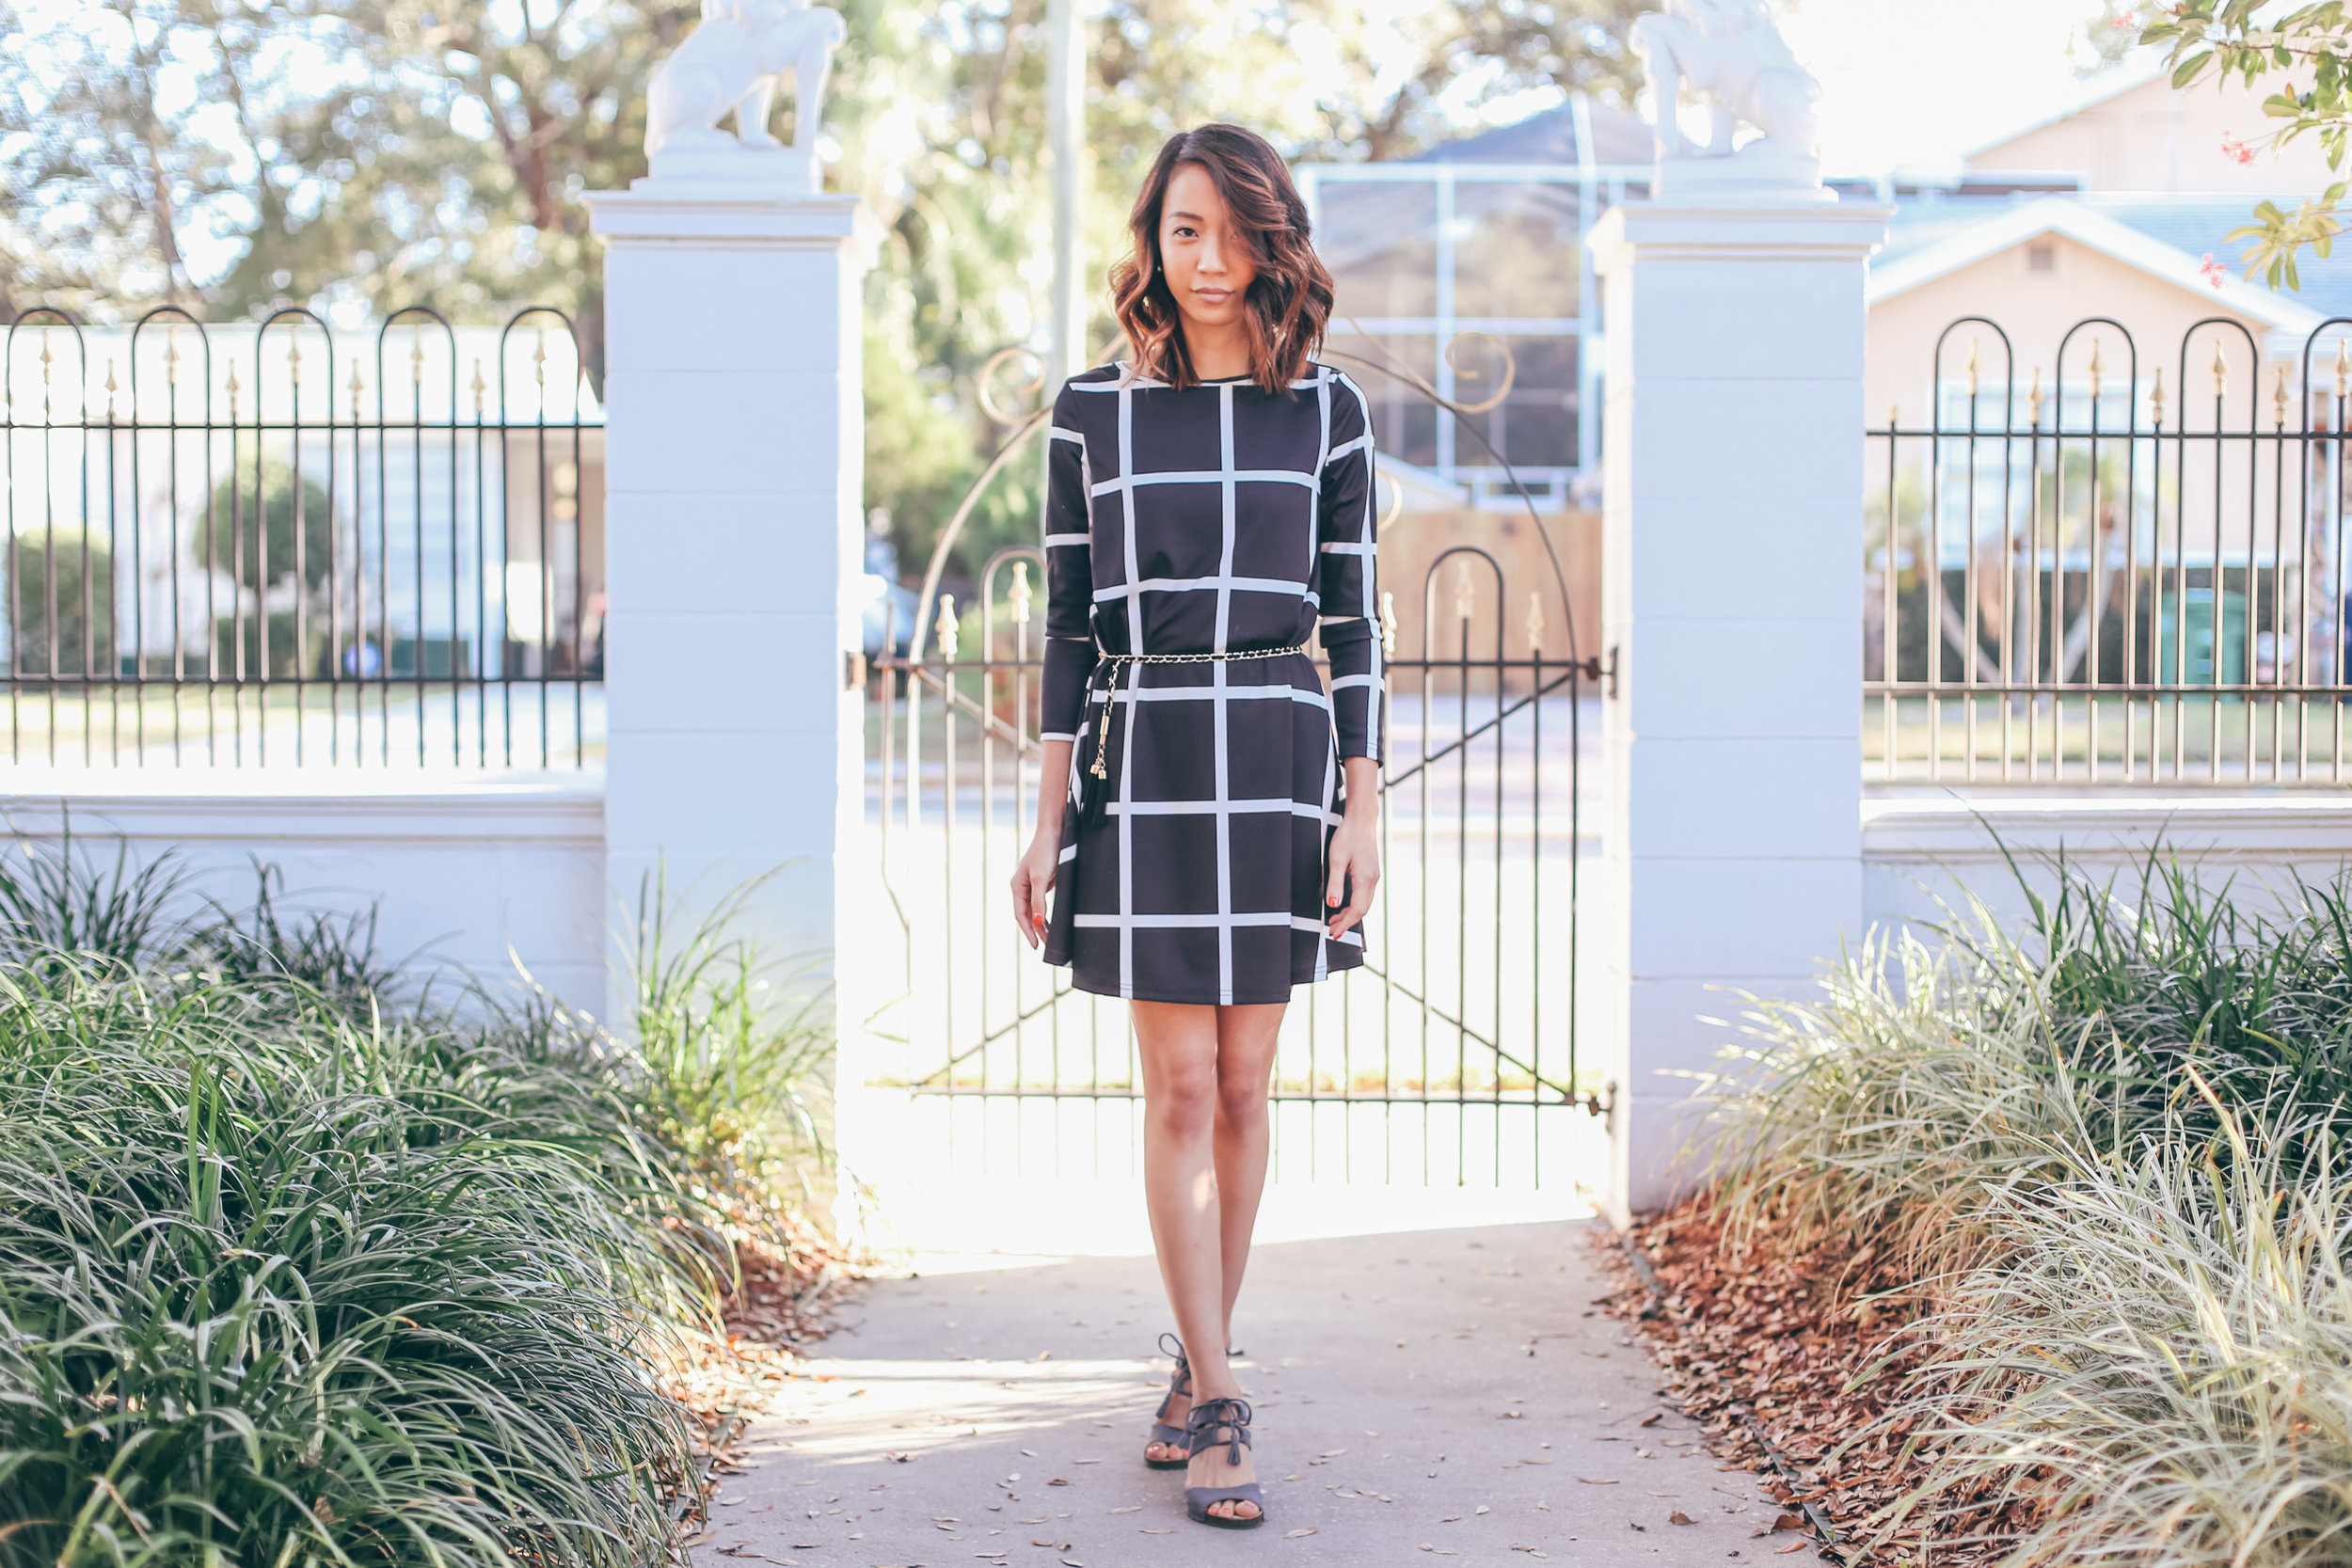 This Jenn Girl - Shein Swing Dress 1